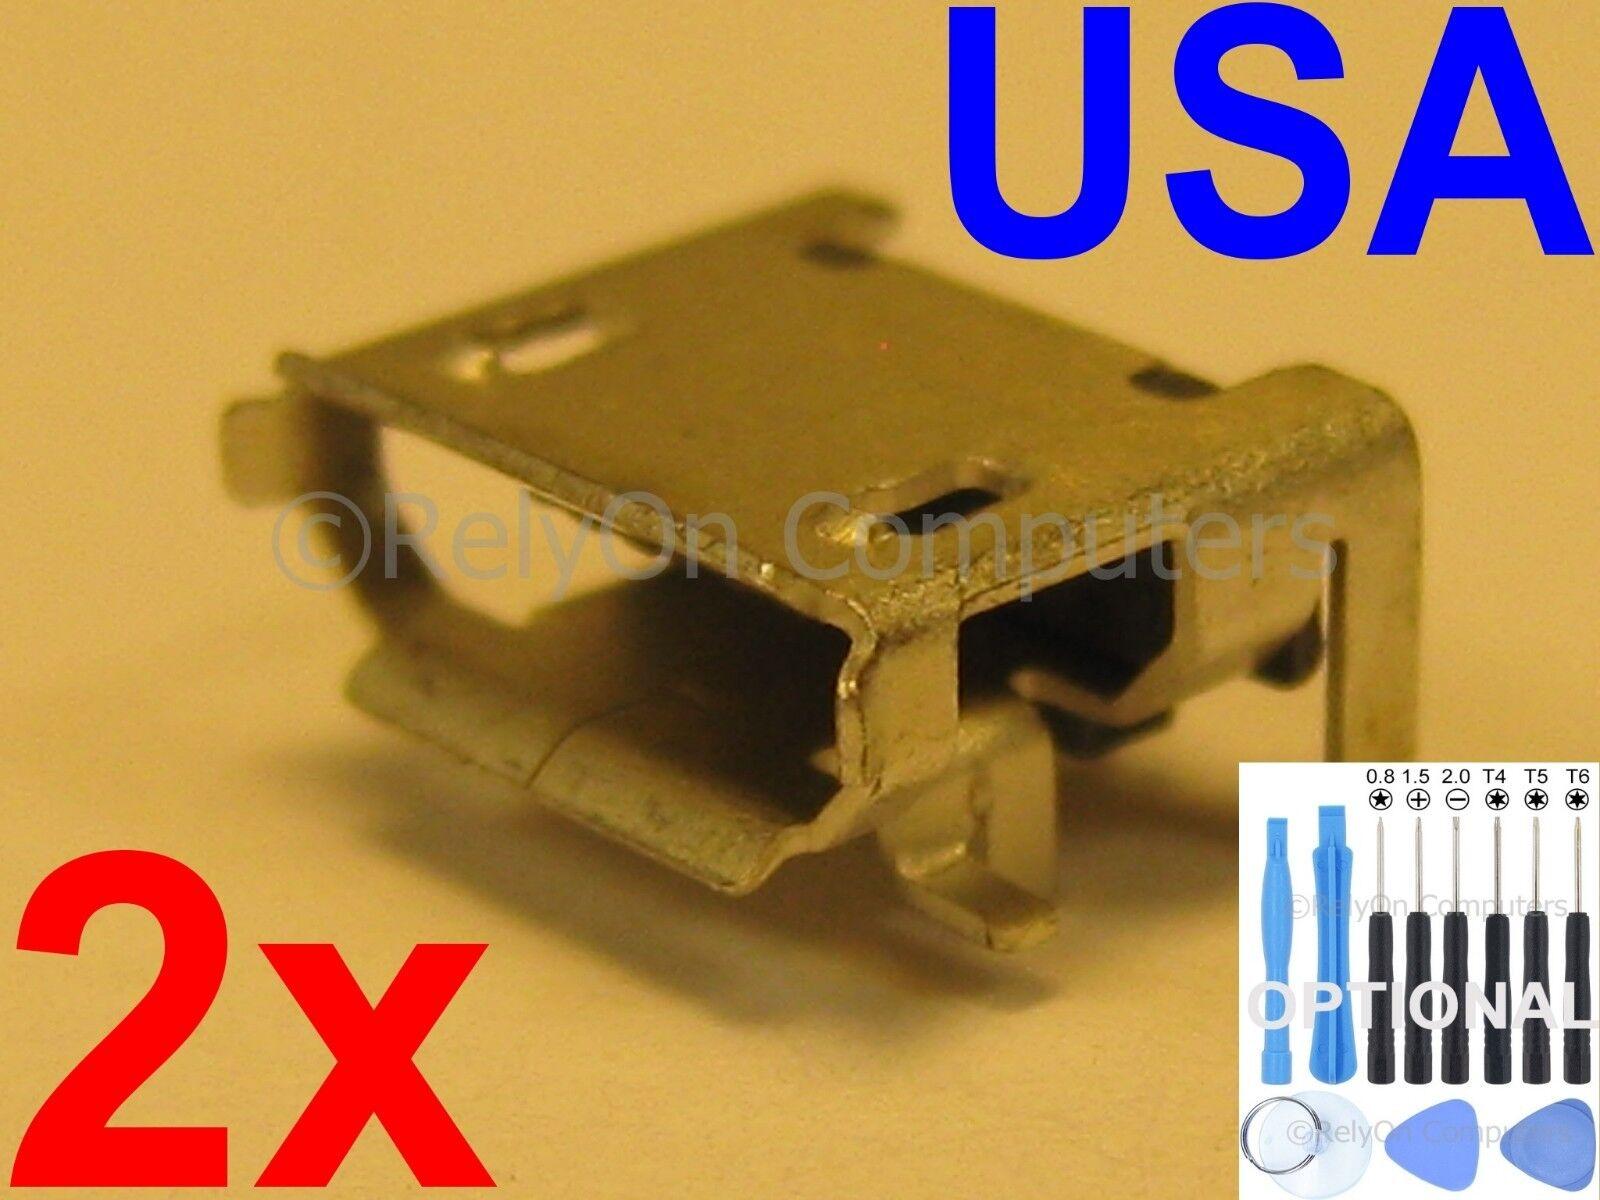 2x Lot of OEM Type Micro USB Charging Port For JBL Pulse 2